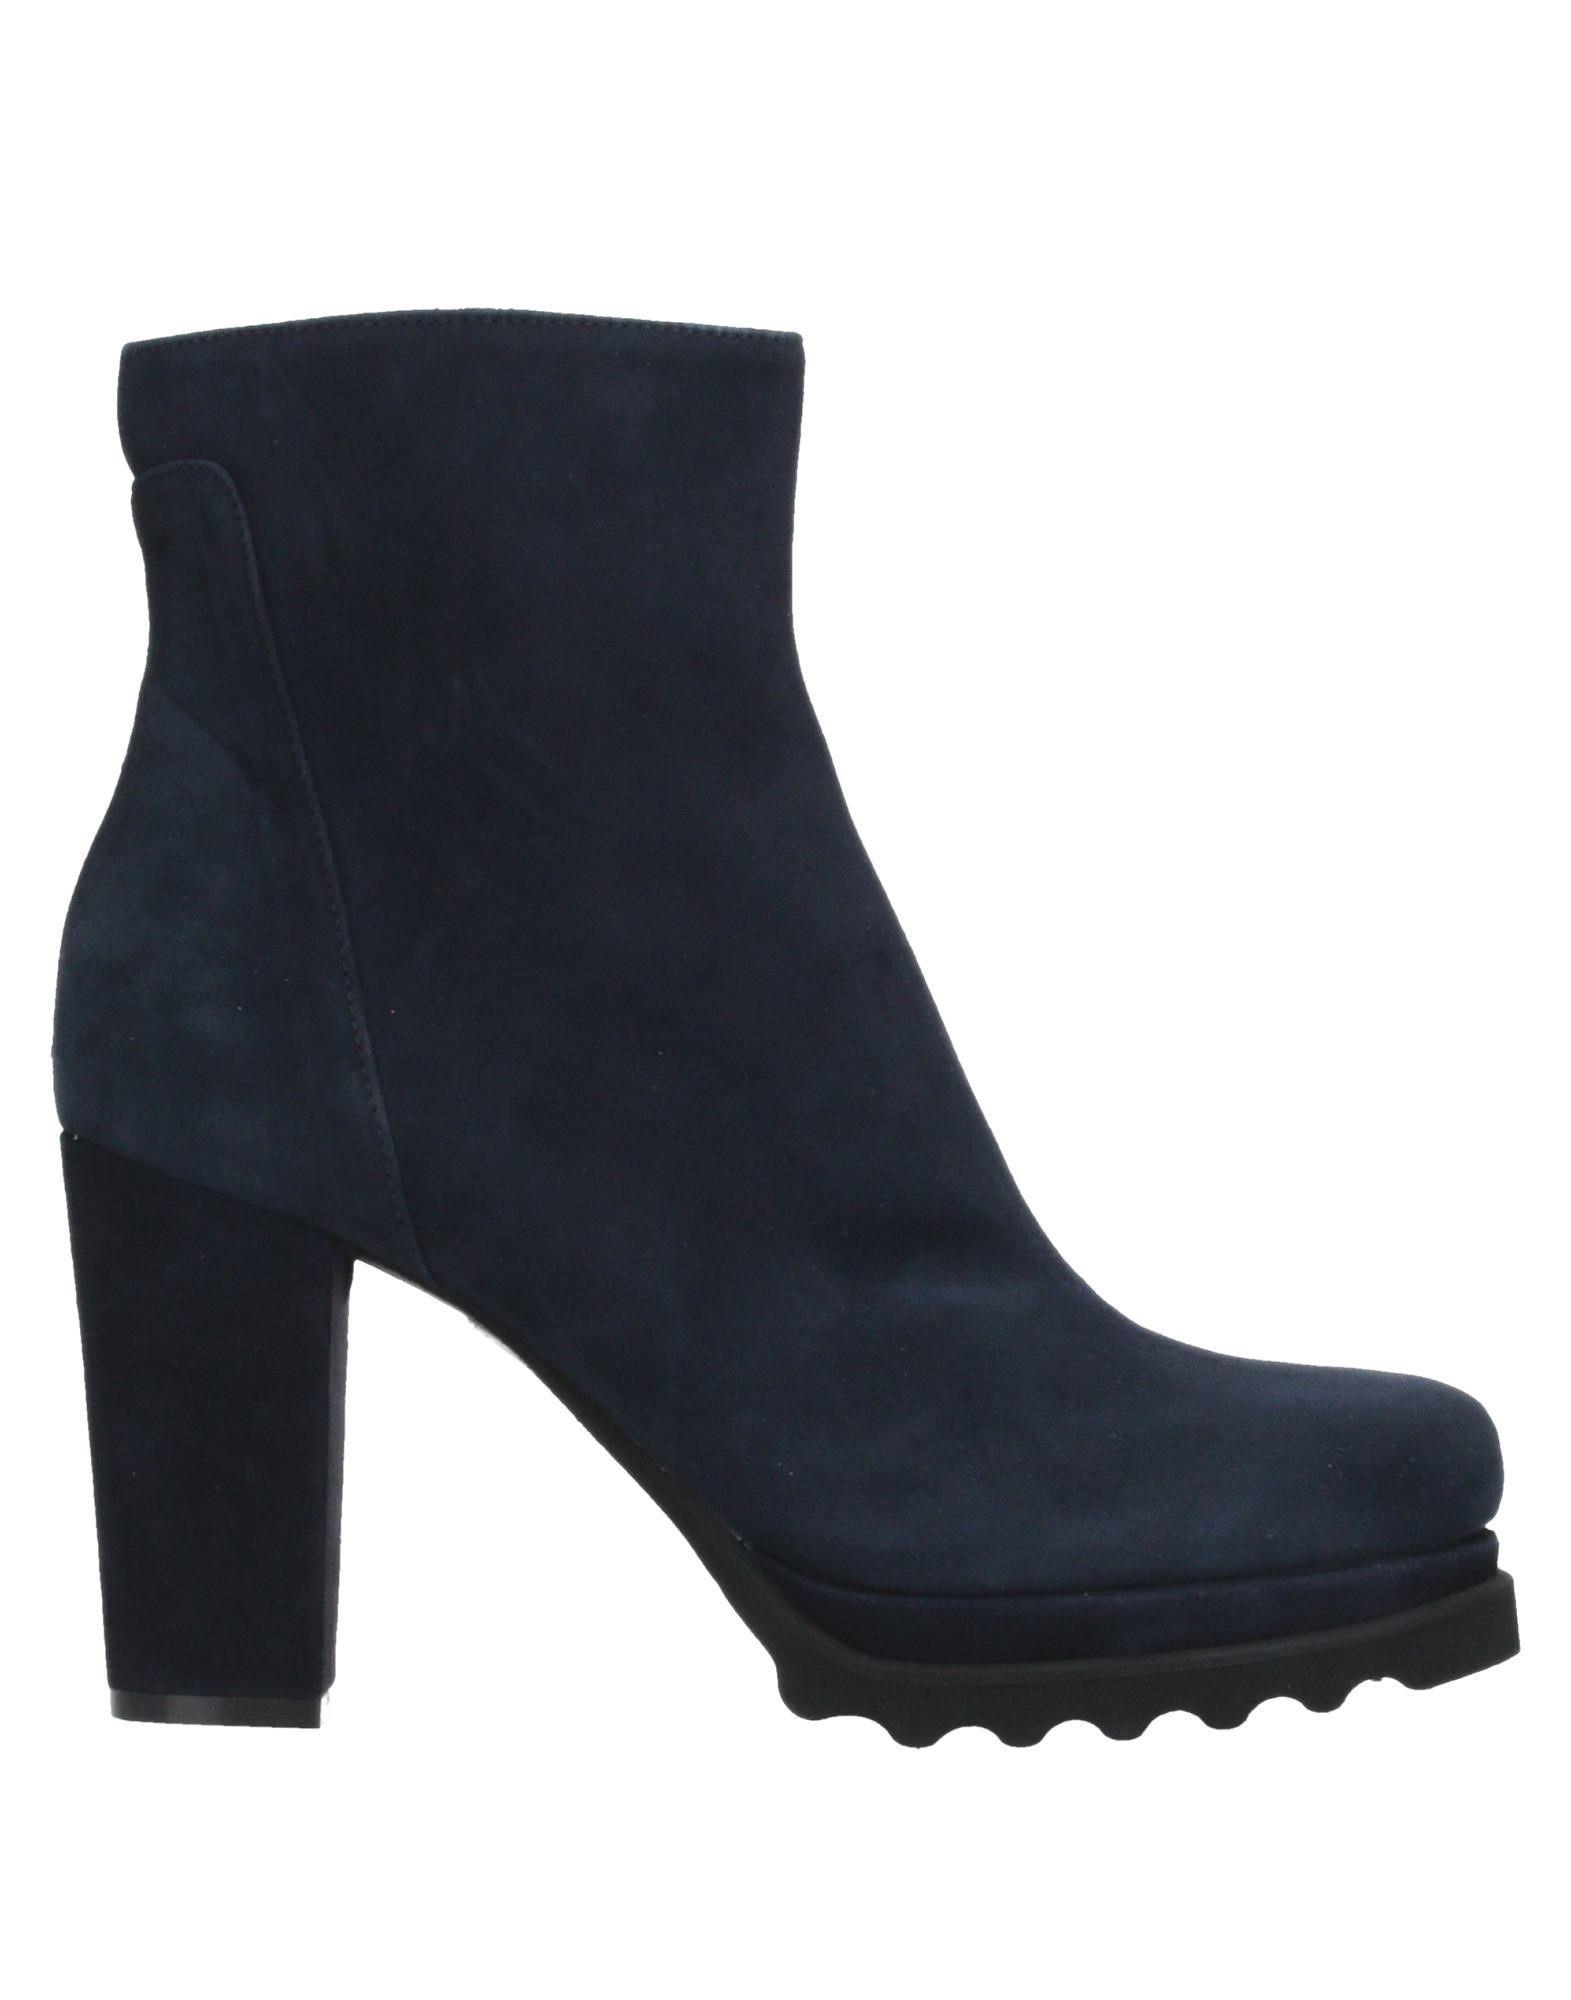 PARU Milano Полусапоги и высокие ботинки o6 milano полусапоги и высокие ботинки